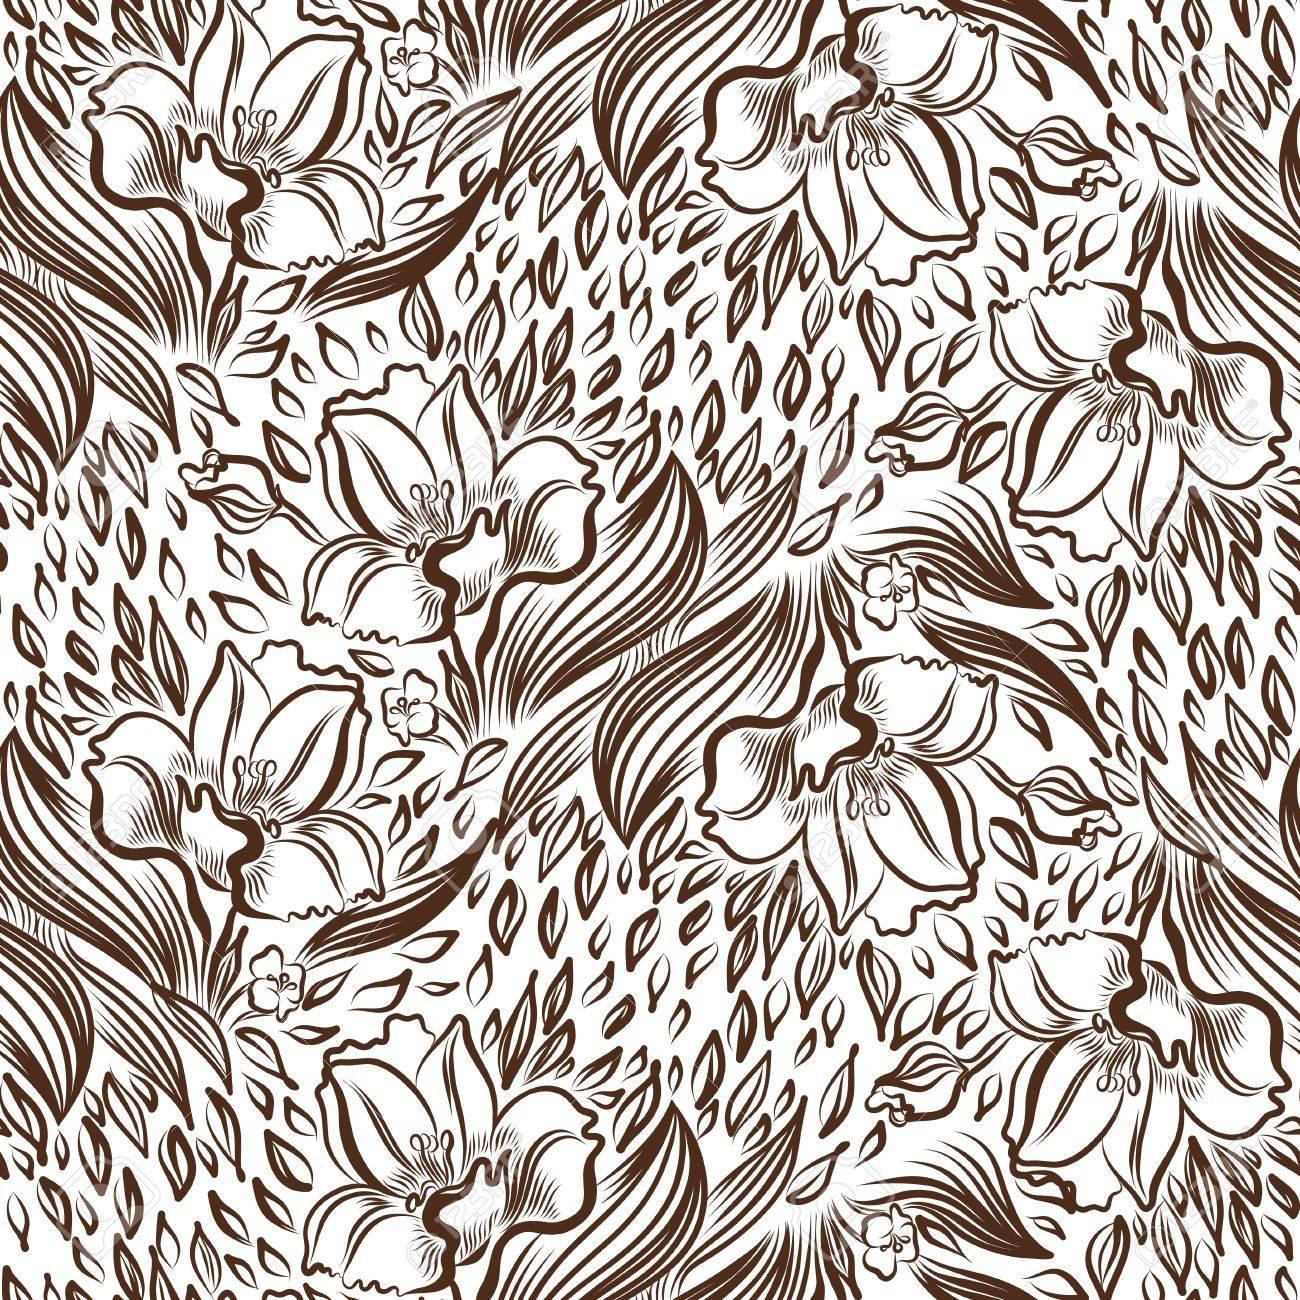 Fond D Écran Tatouage narcissus ressort de dessin fleur de tatouage. fond d'écran pattern